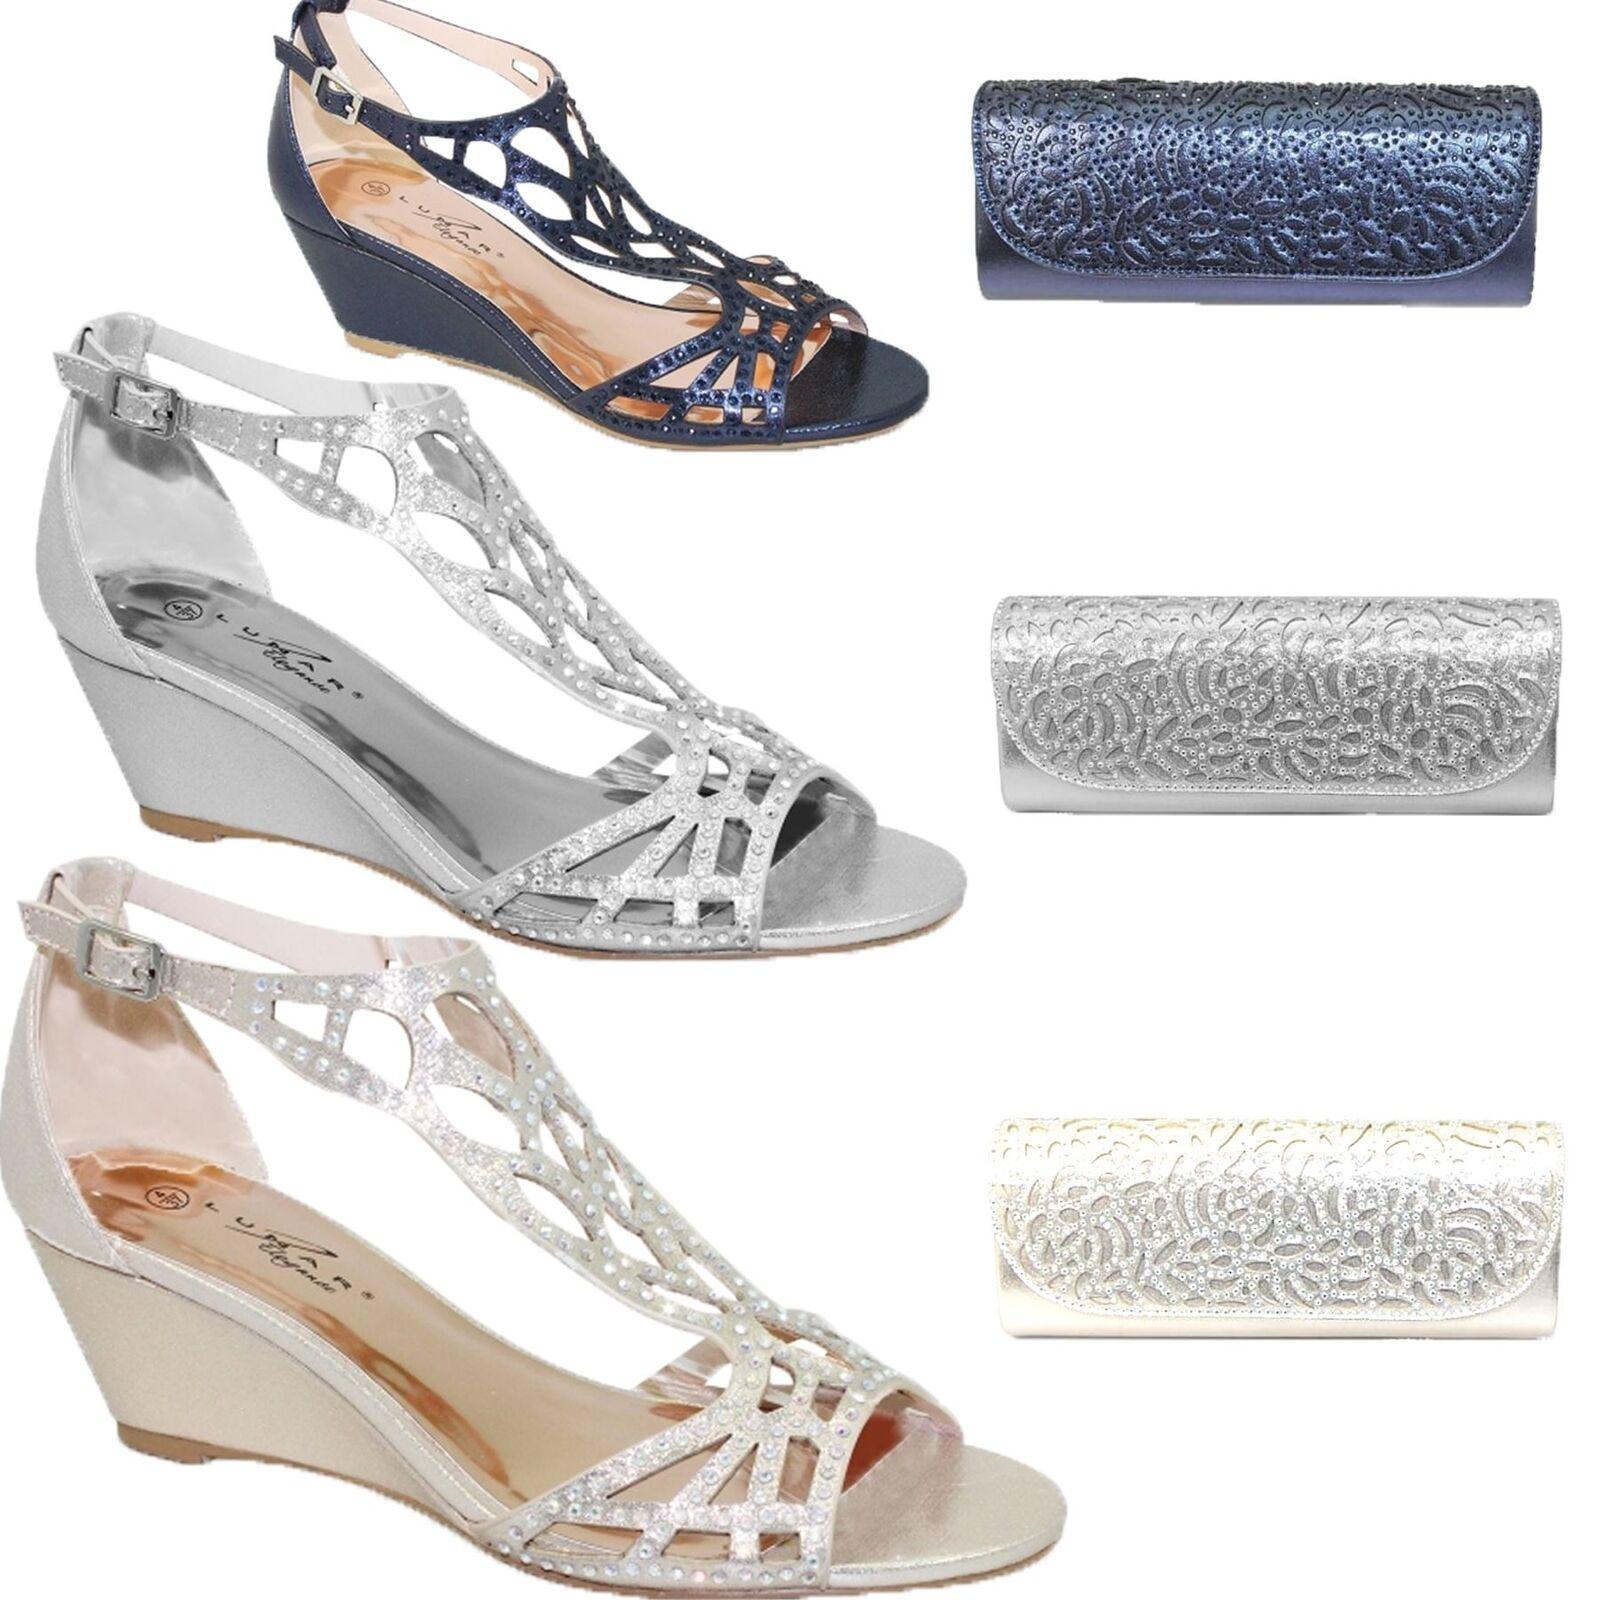 FLC111 Denton Strap Diamante Rhinestone Peep Toe Wedge Sandale Bag Clutch